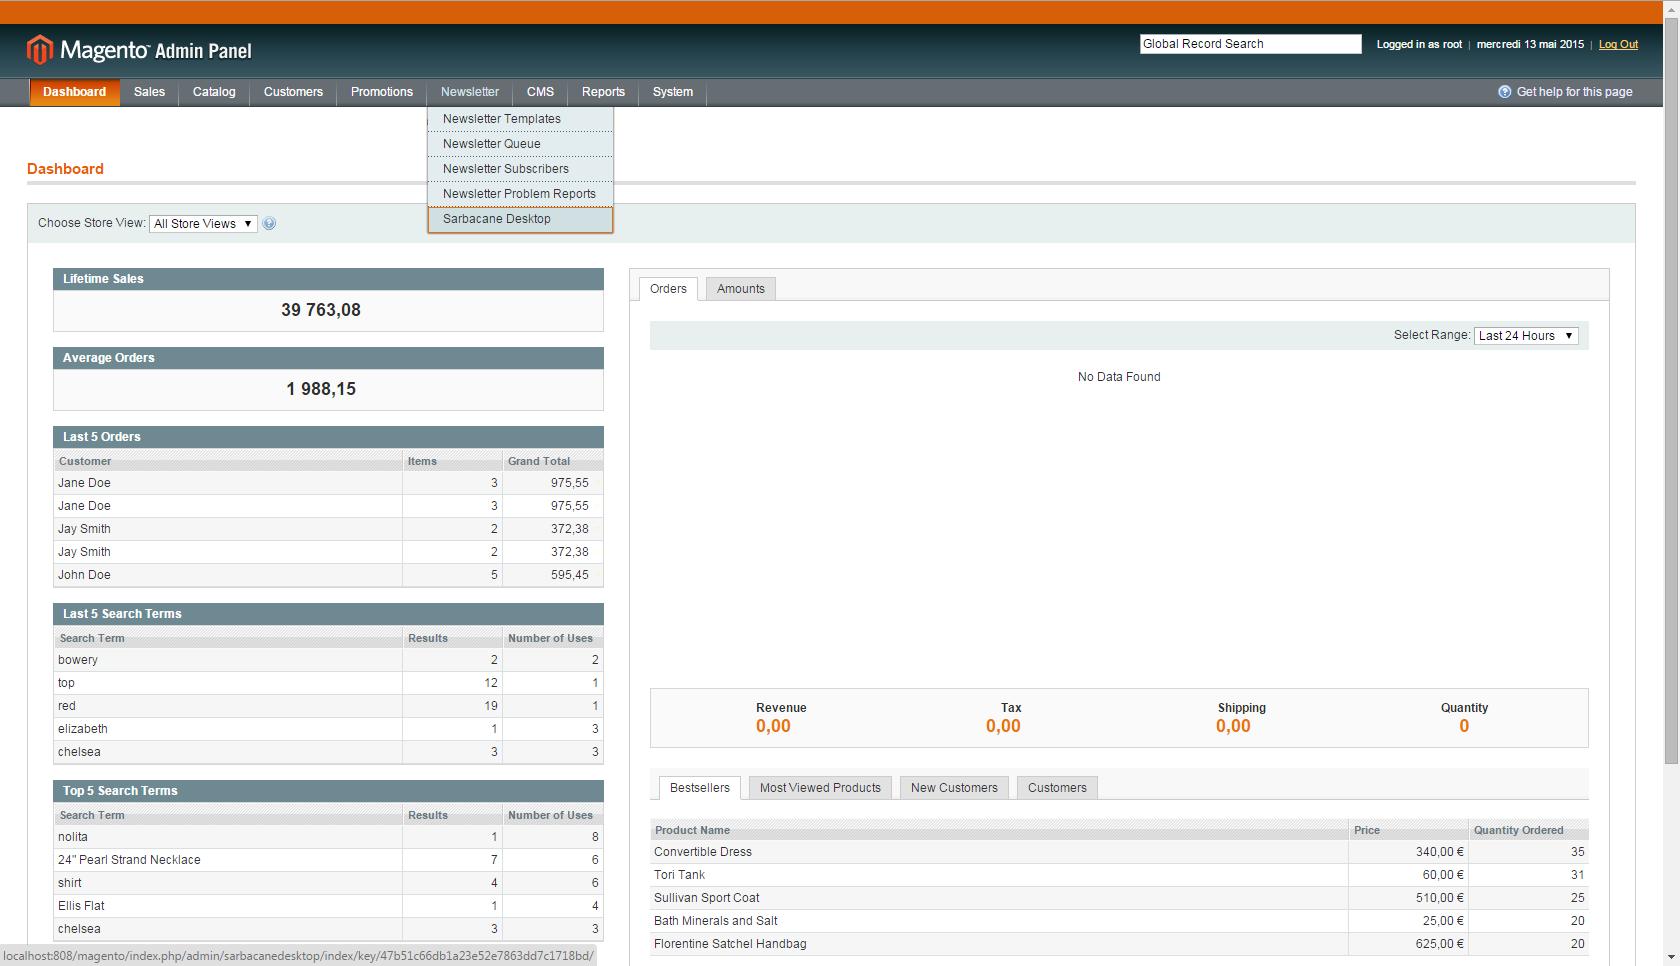 The Magento Admin Portal